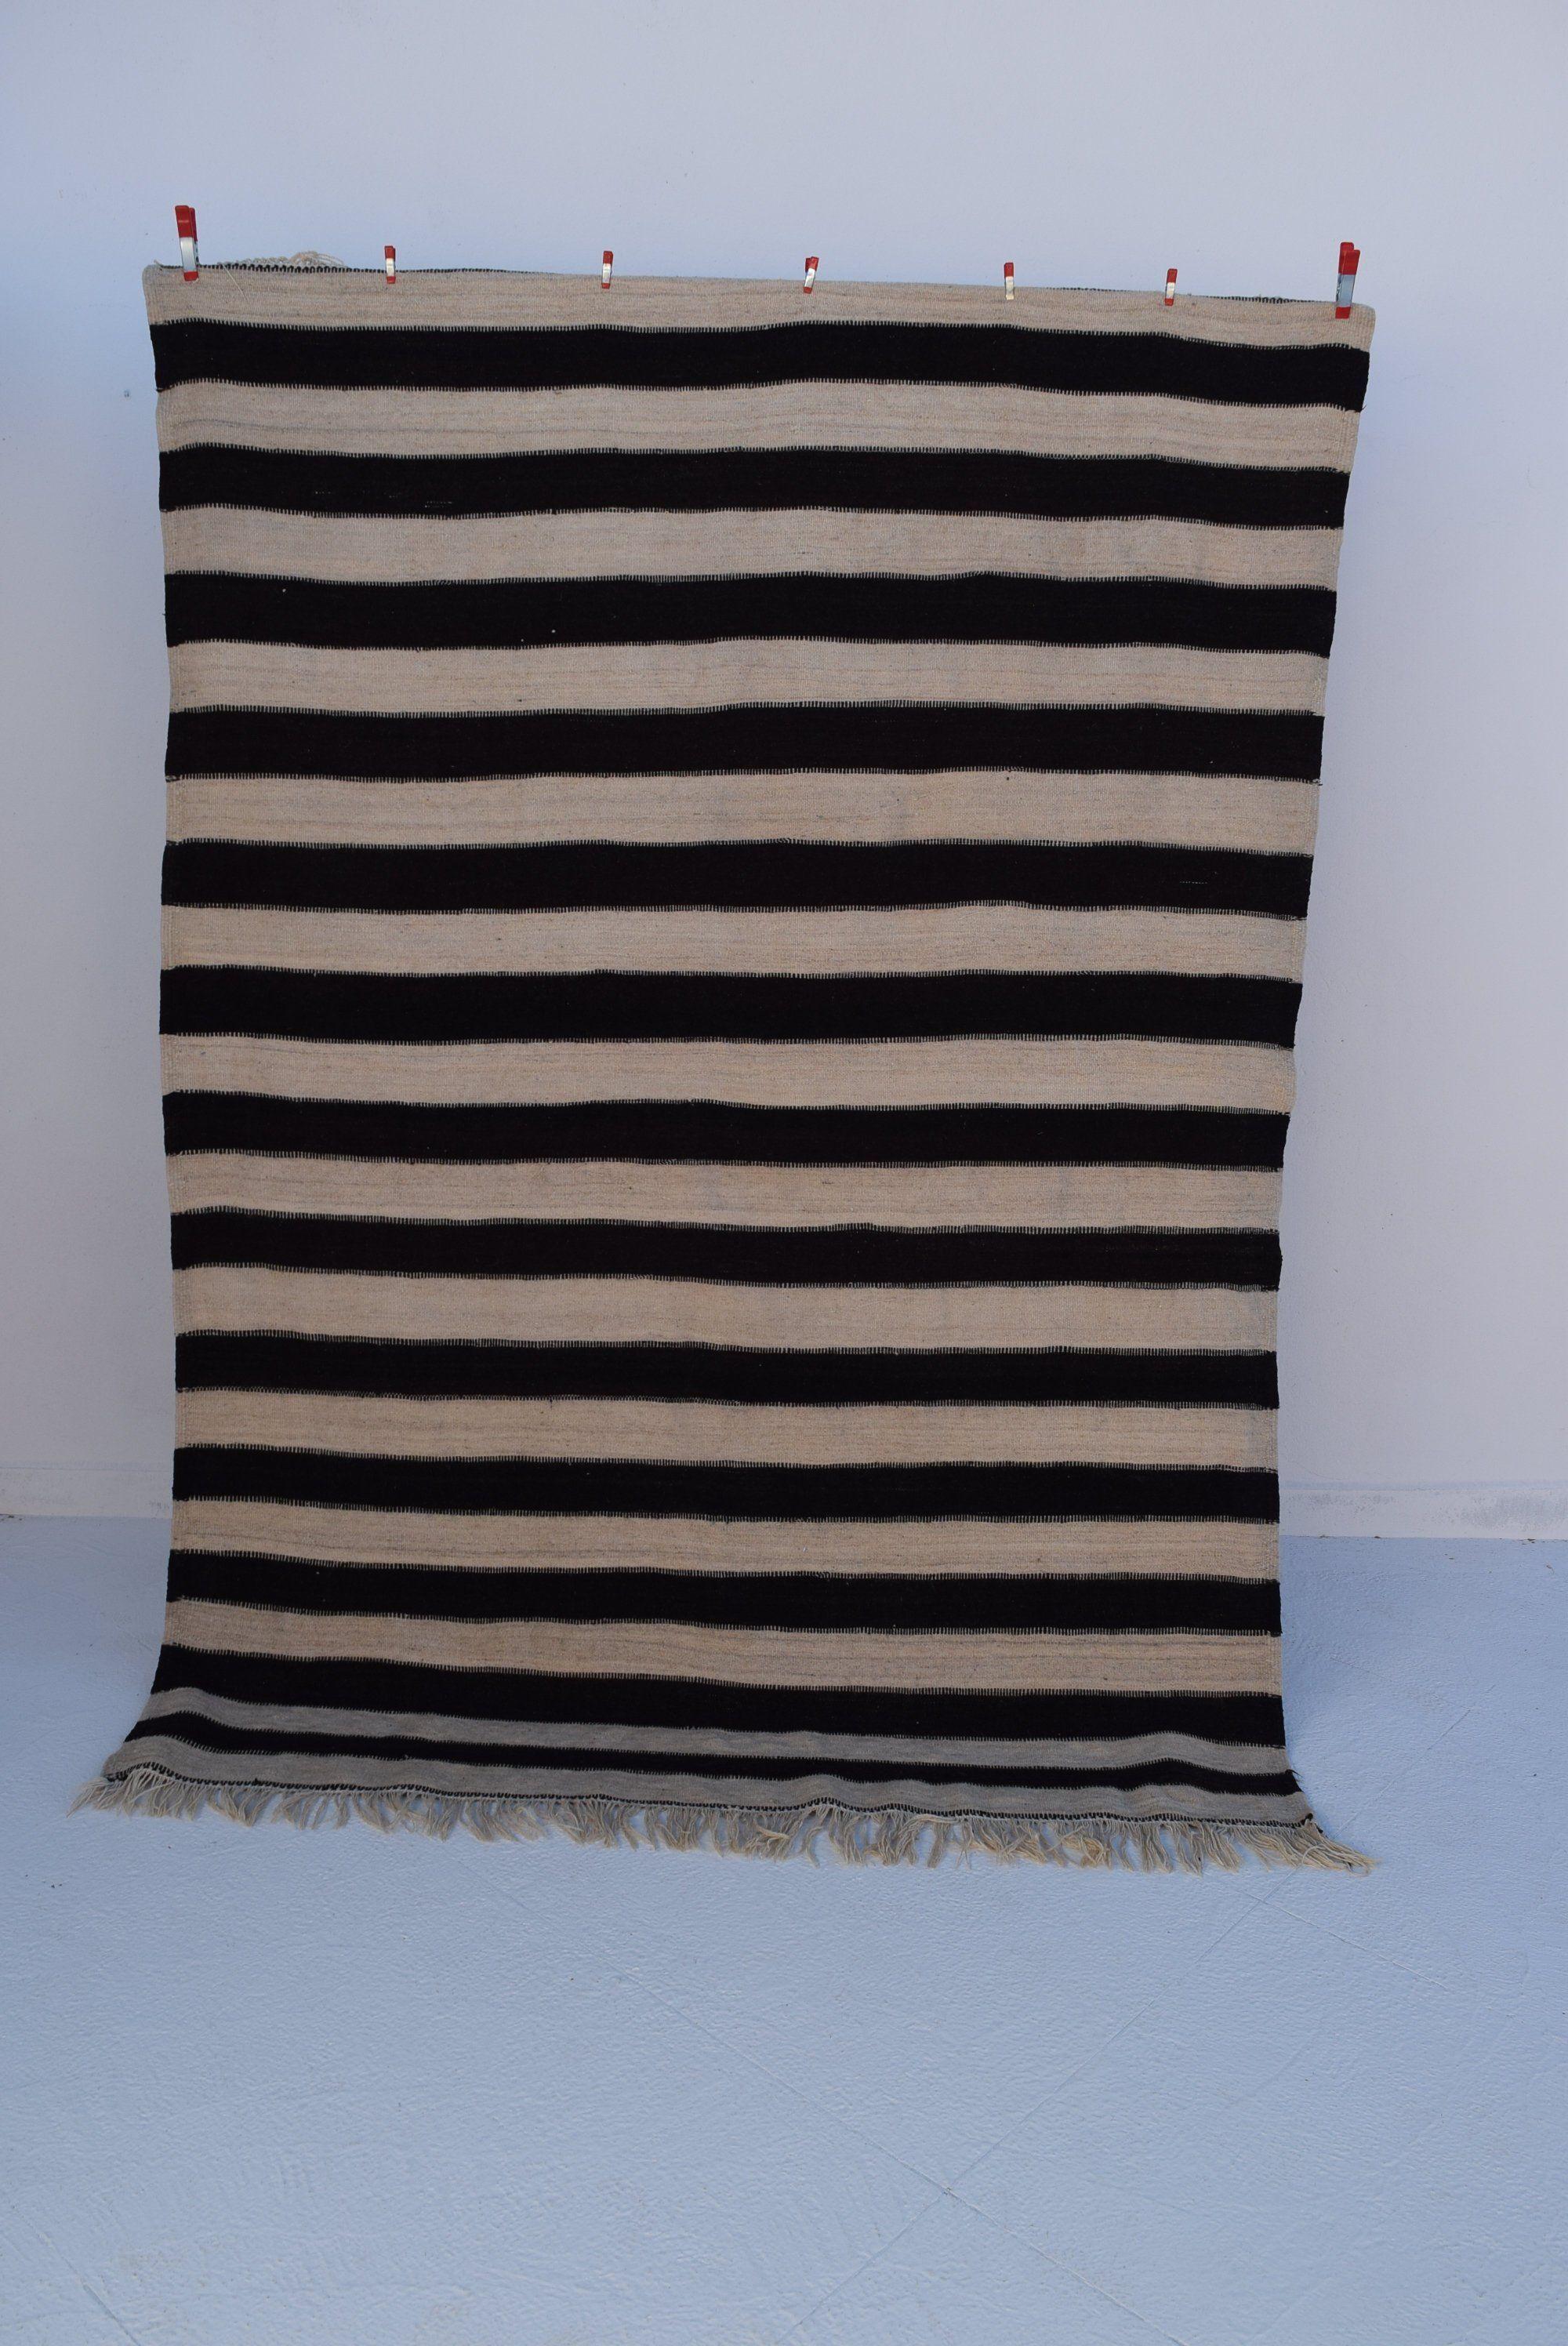 Moroccan Kilim Rug 5x7 Black White Striped 100 Wool Berber